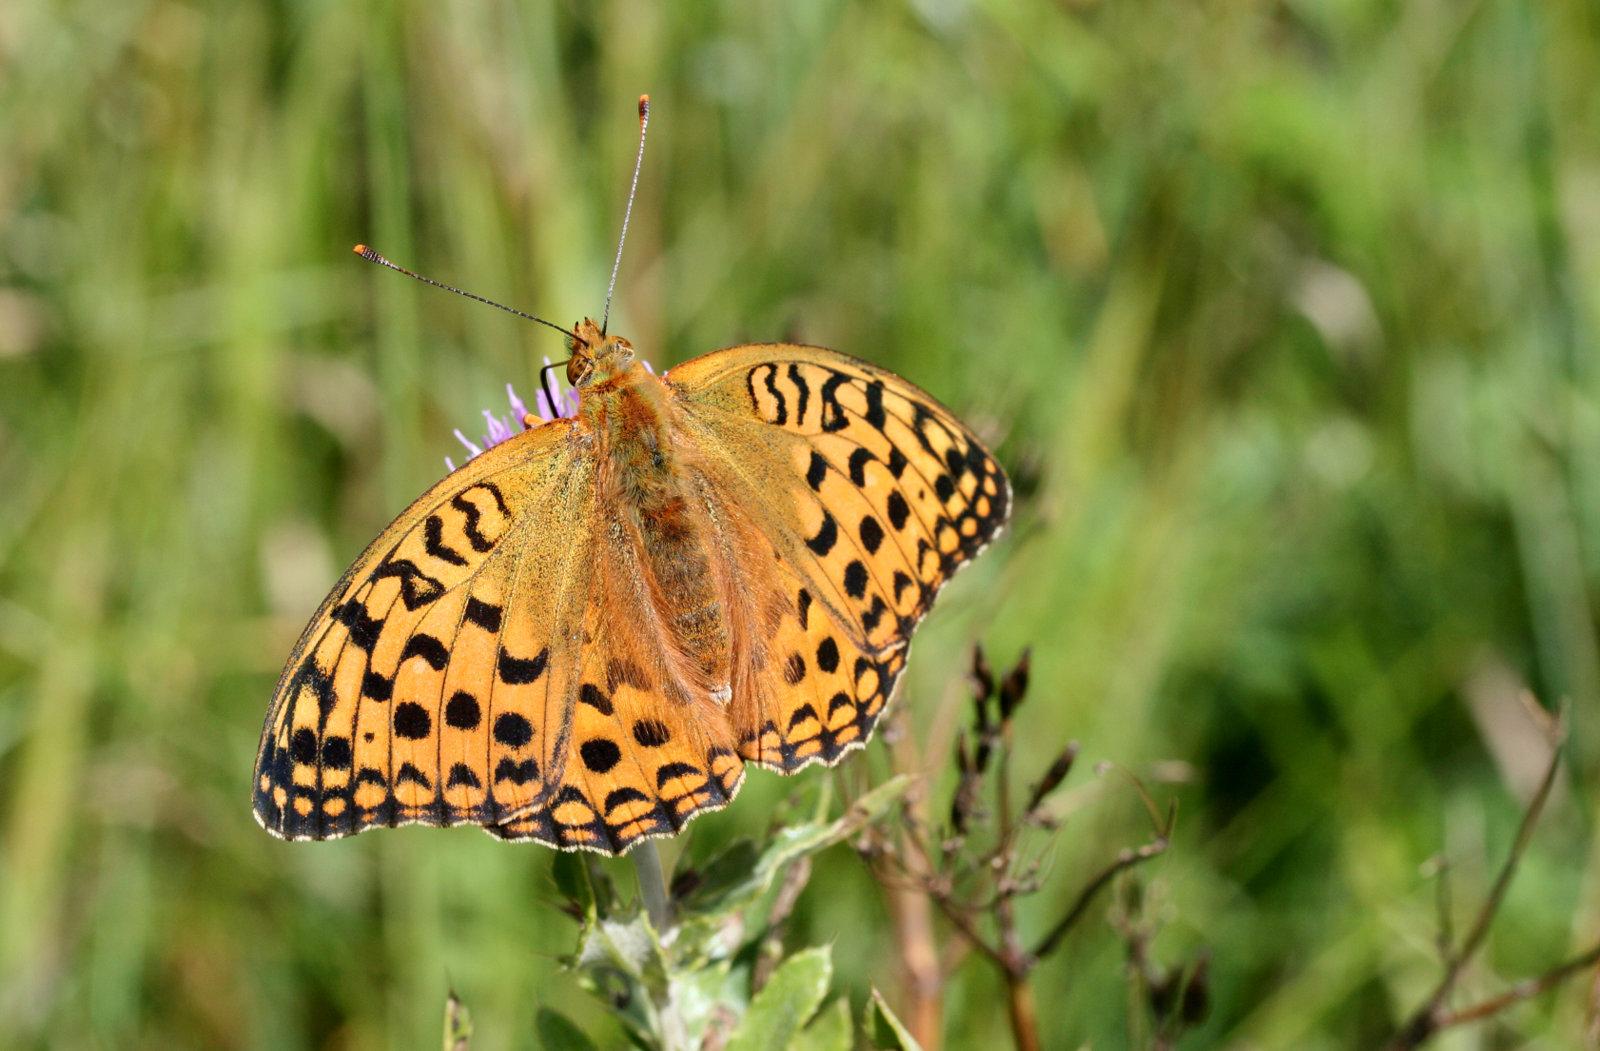 Skovperlemorsommerfugl, Fabriciana adippe